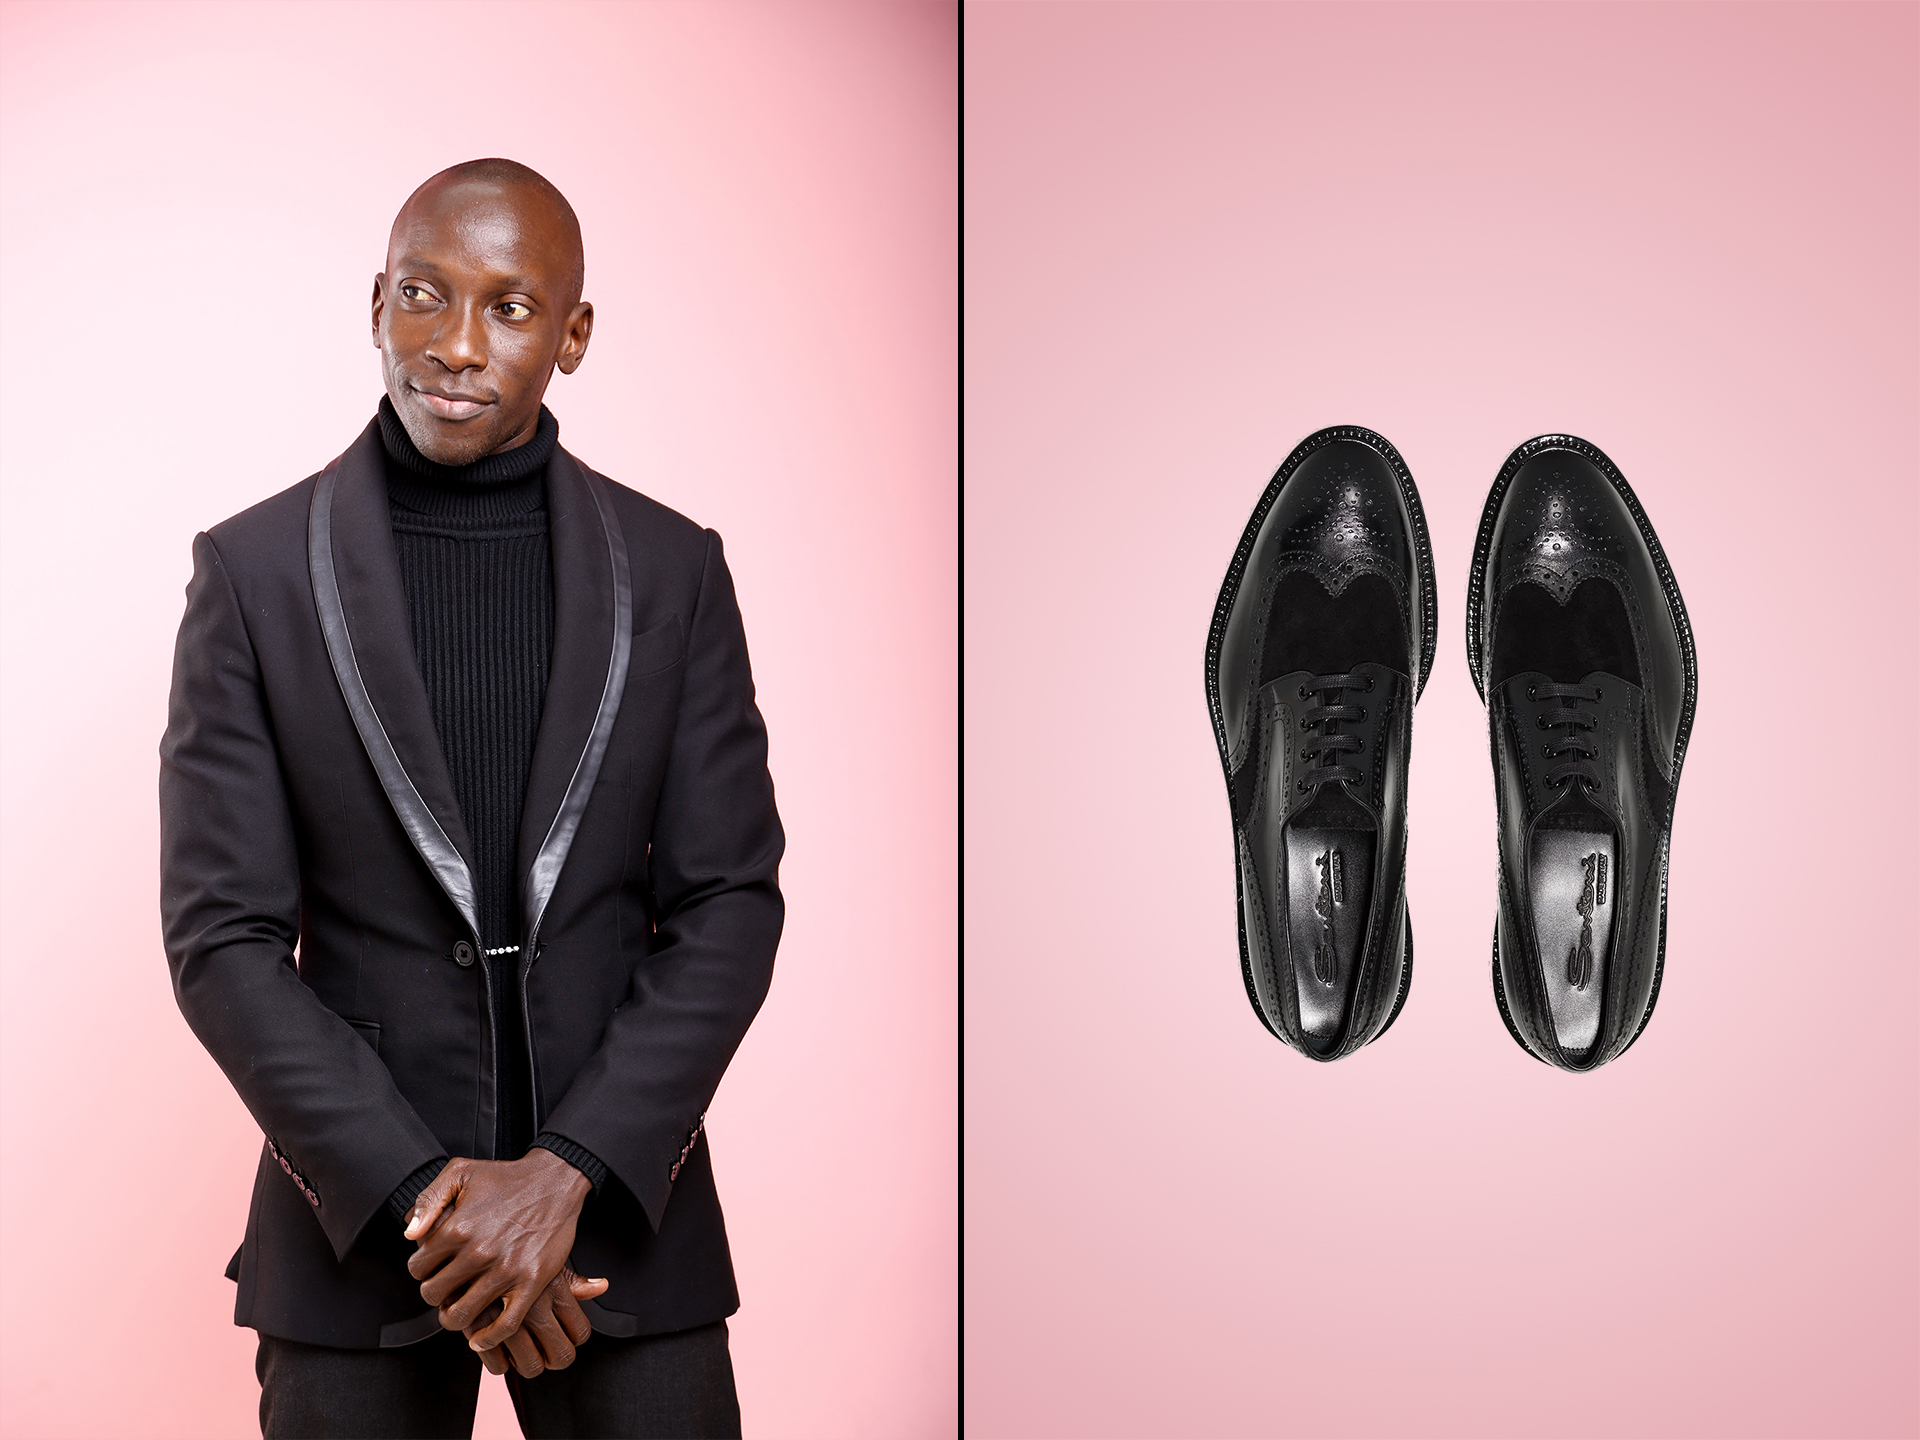 men's designer jackets and shoes Nairobi Kenya